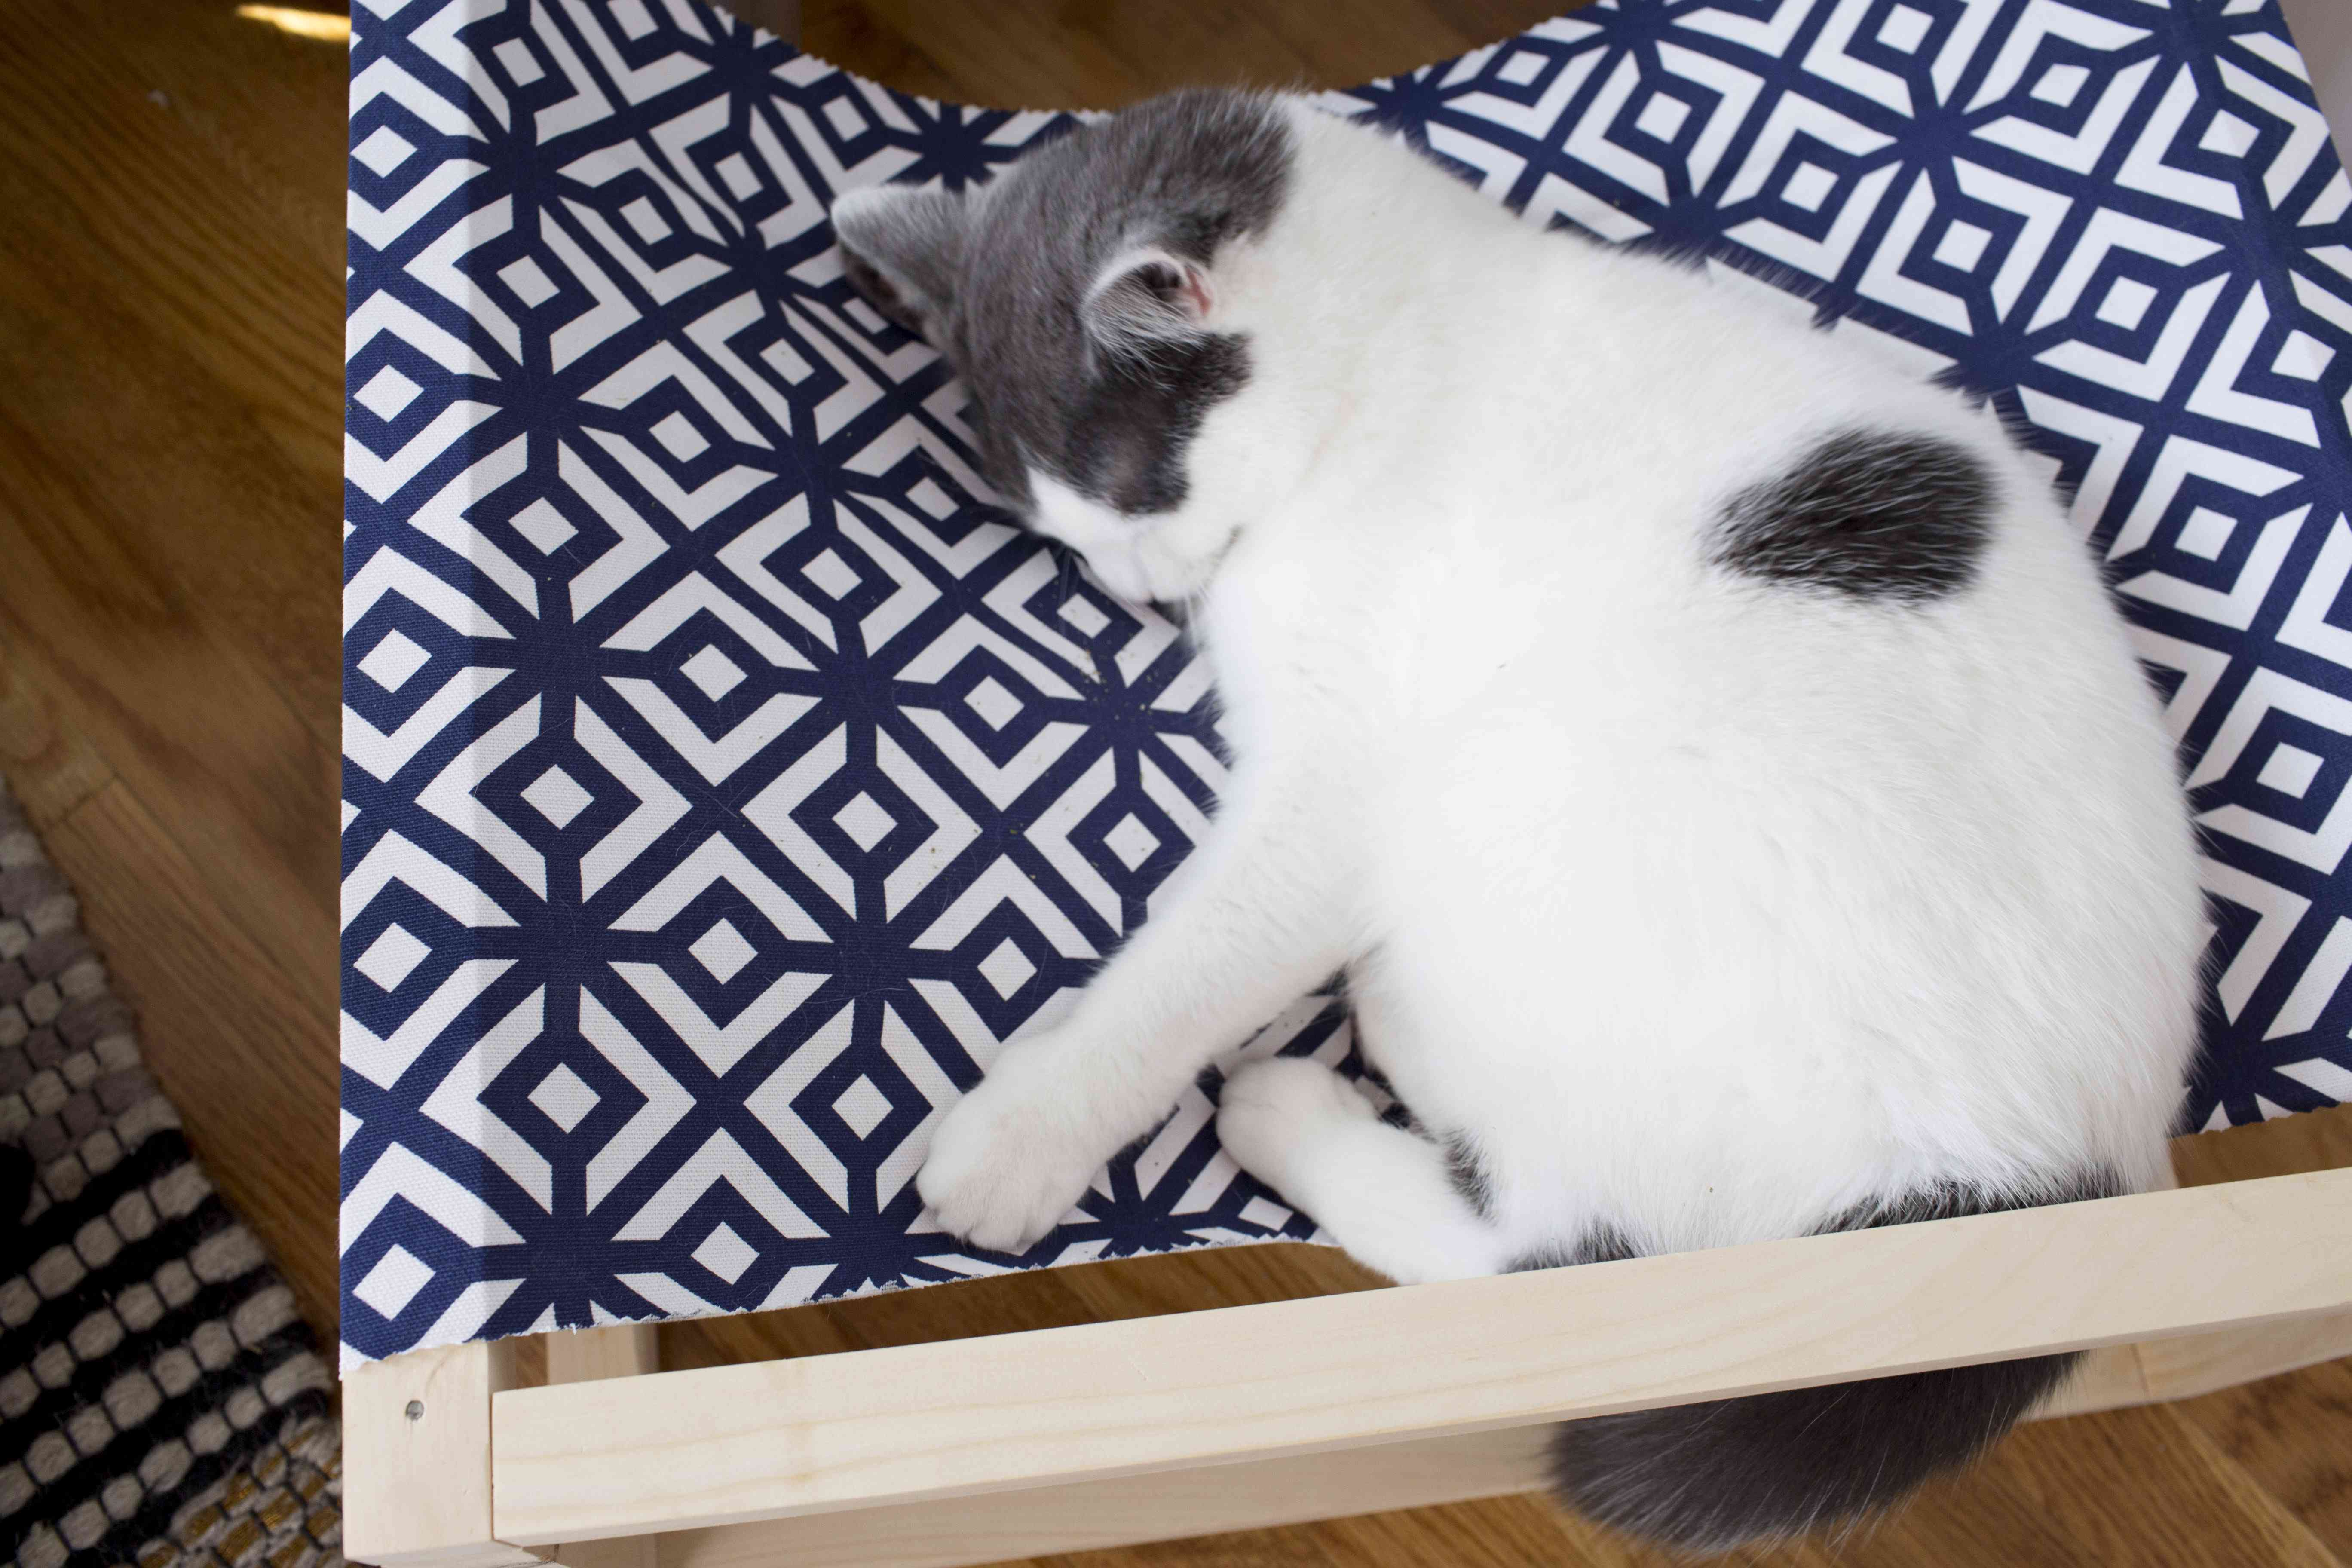 Cat sleeping in cat hammock